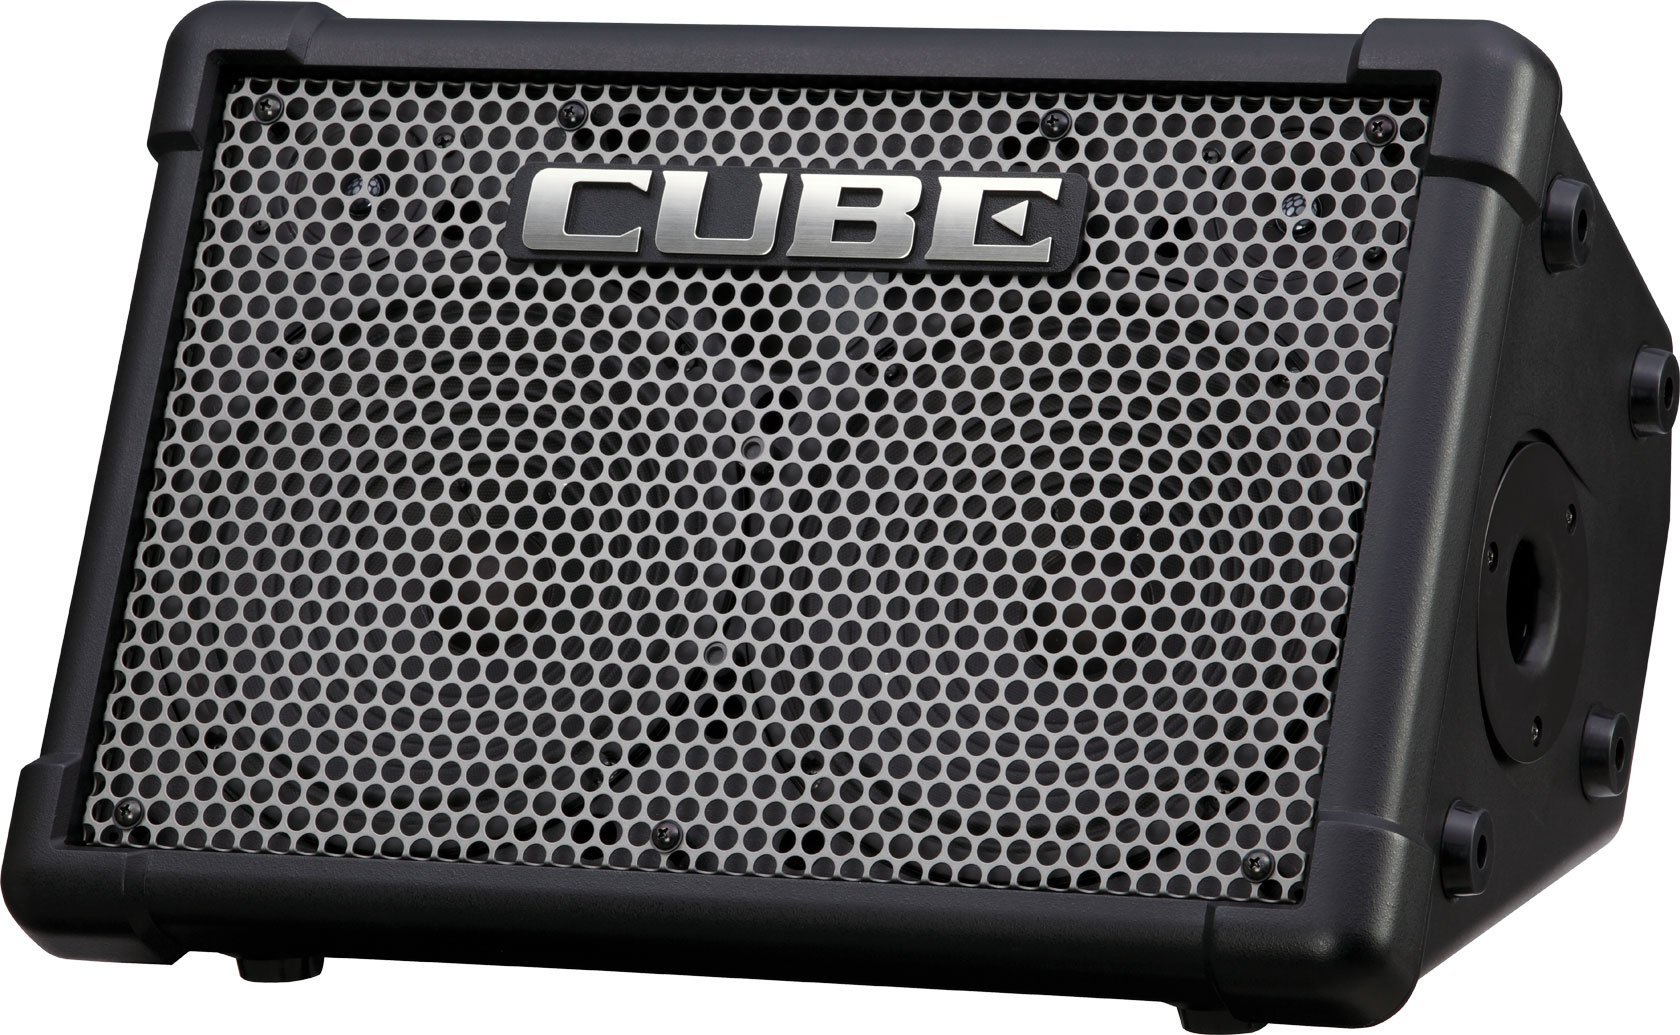 Roland Cube Street Ex 4 Channel 50 Watt Battery Powered Load Cell Amplifier Ldu 691 Specifications Musical Instruments